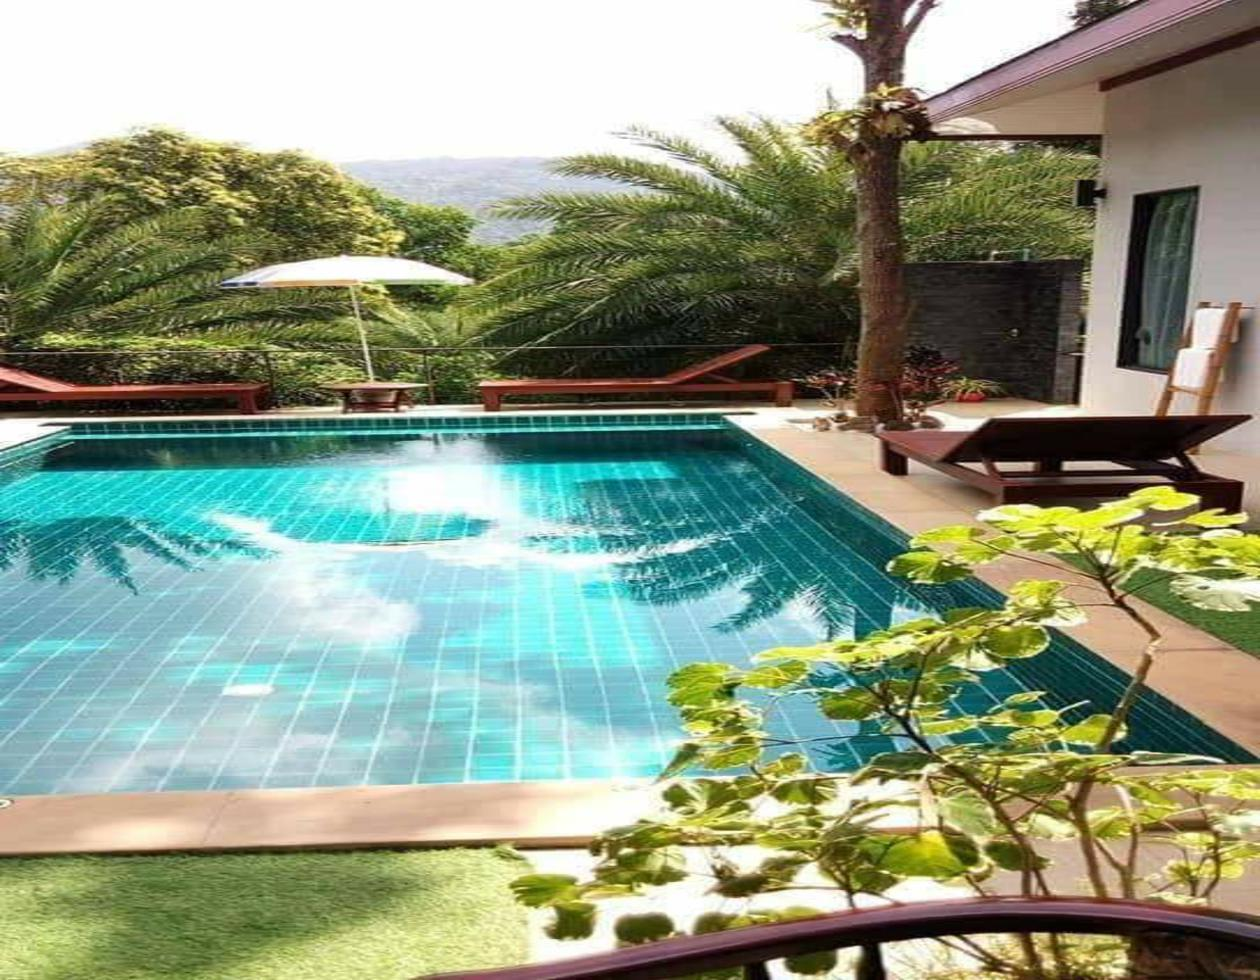 4Bedroom Villa Hin Kong Luxury Swimming pool Villa วิลลา 5 ห้องนอน 4 ห้องน้ำส่วนตัว ขนาด 300 ตร.ม. – วกตุ่ม